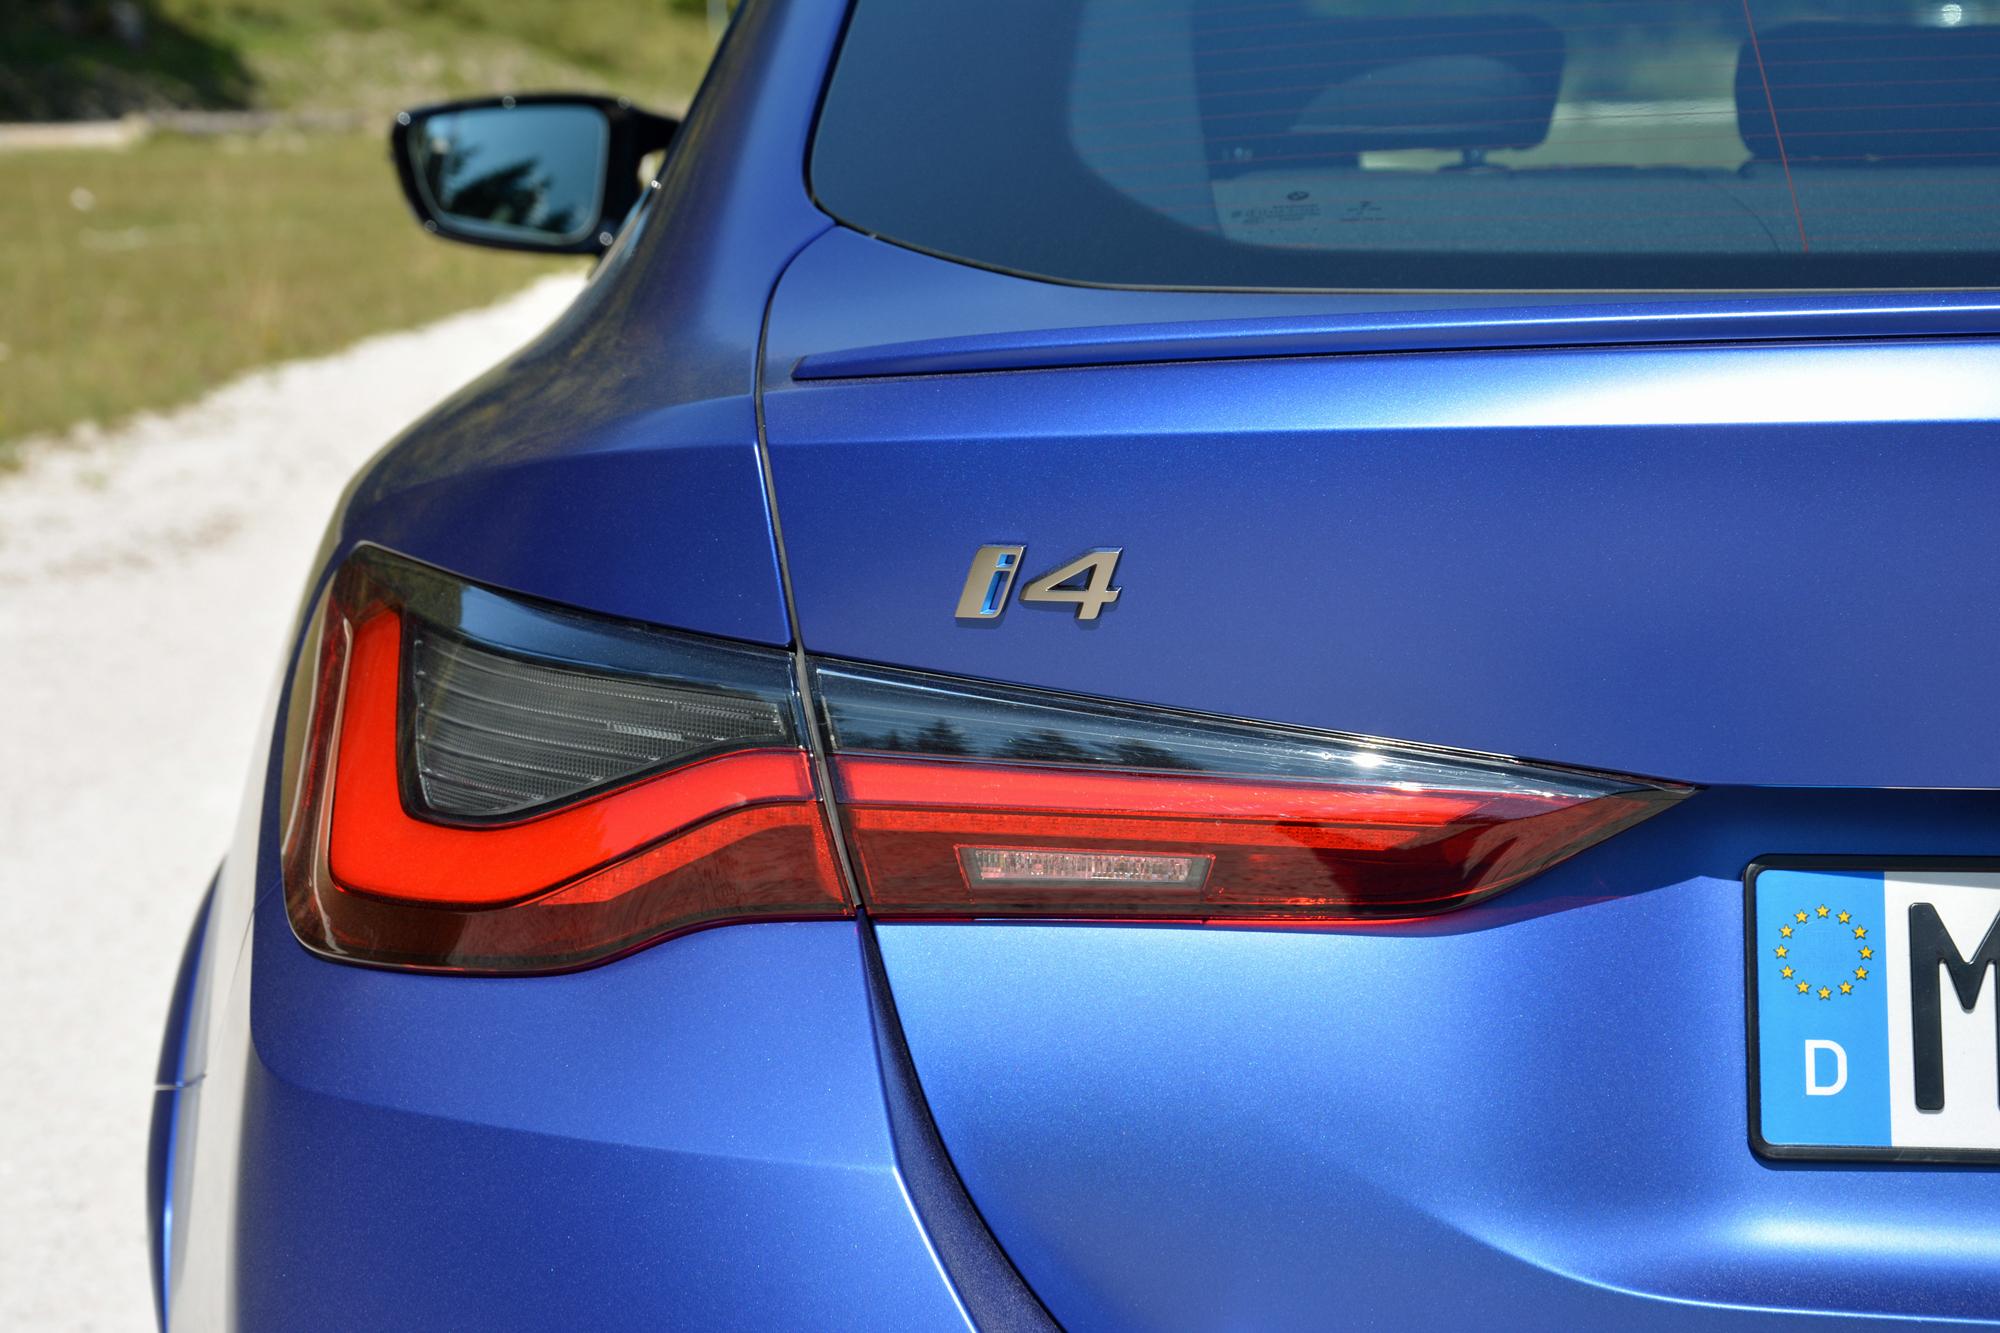 2022 BMW i4 M50 rear left close